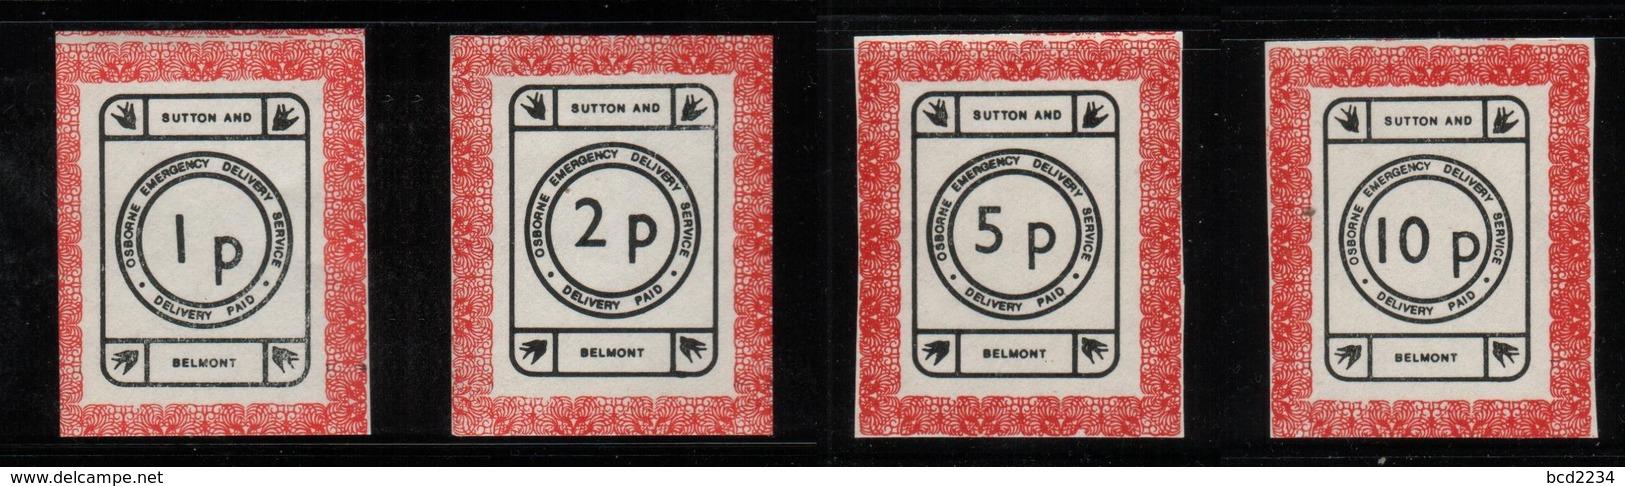 GREAT BRITAIN GB 1971 POSTAL STRIKE MAIL OSBOURNE EMERGENCY DELIVERY SERVICE SUTTON BELMONT WHITE DECIMAL 1p-10p NHM - Cinderellas